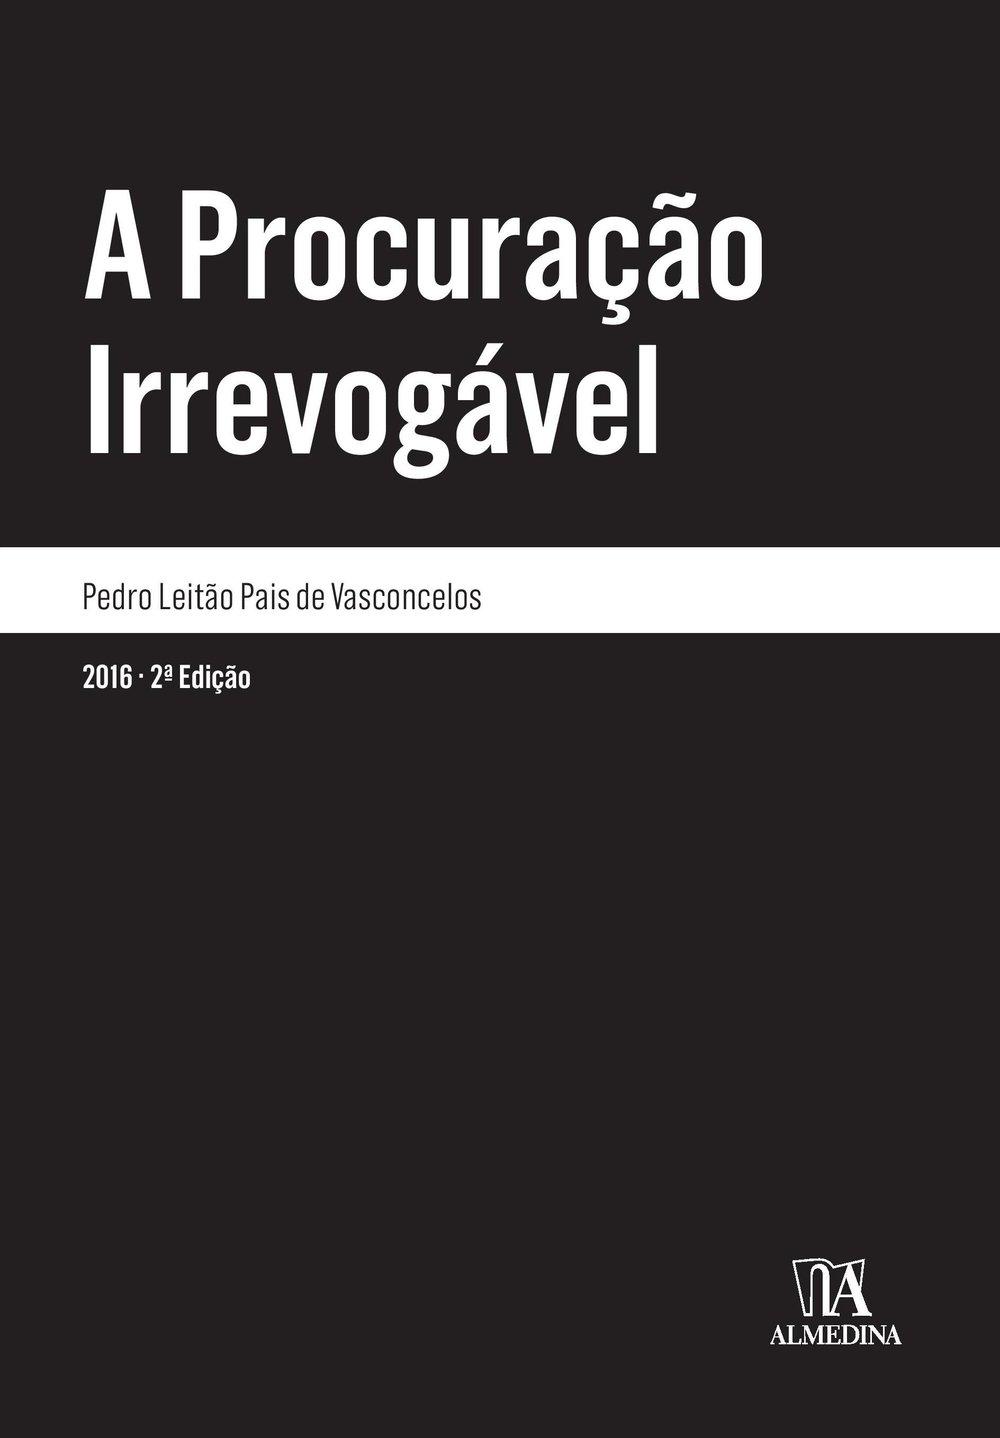 Procuracao_Irrevogavel.jpg